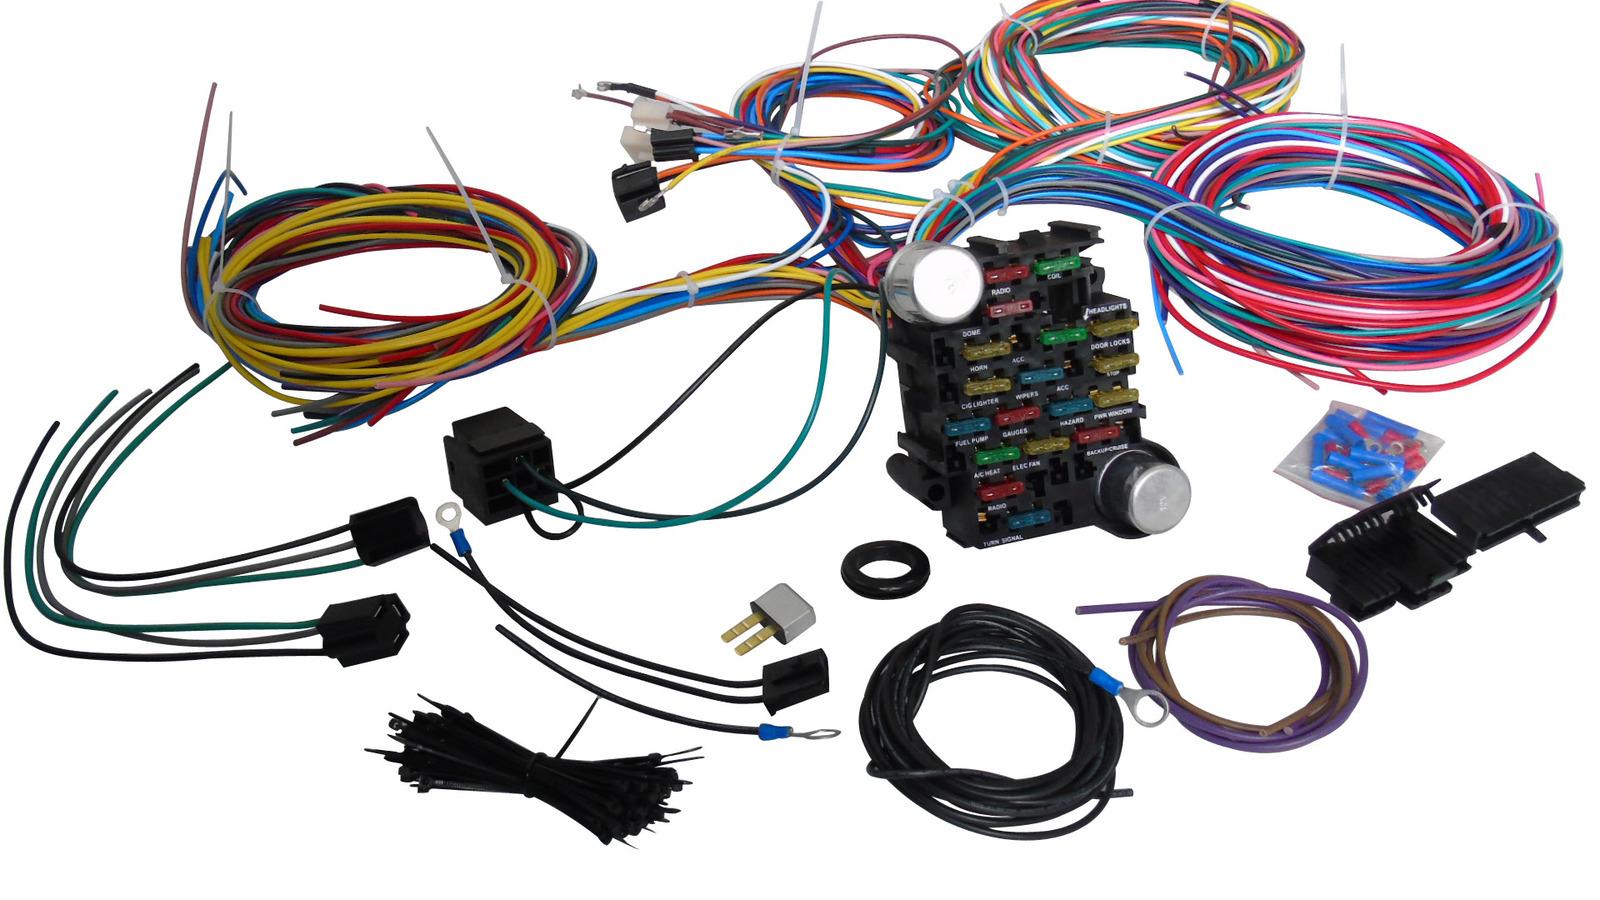 20 circuit wiring harness chevy mopar ford jeep hotrods universal rh swperformanceparts net 18 Circuit Universal Wiring Harness Universal Wiring Harness Diagram